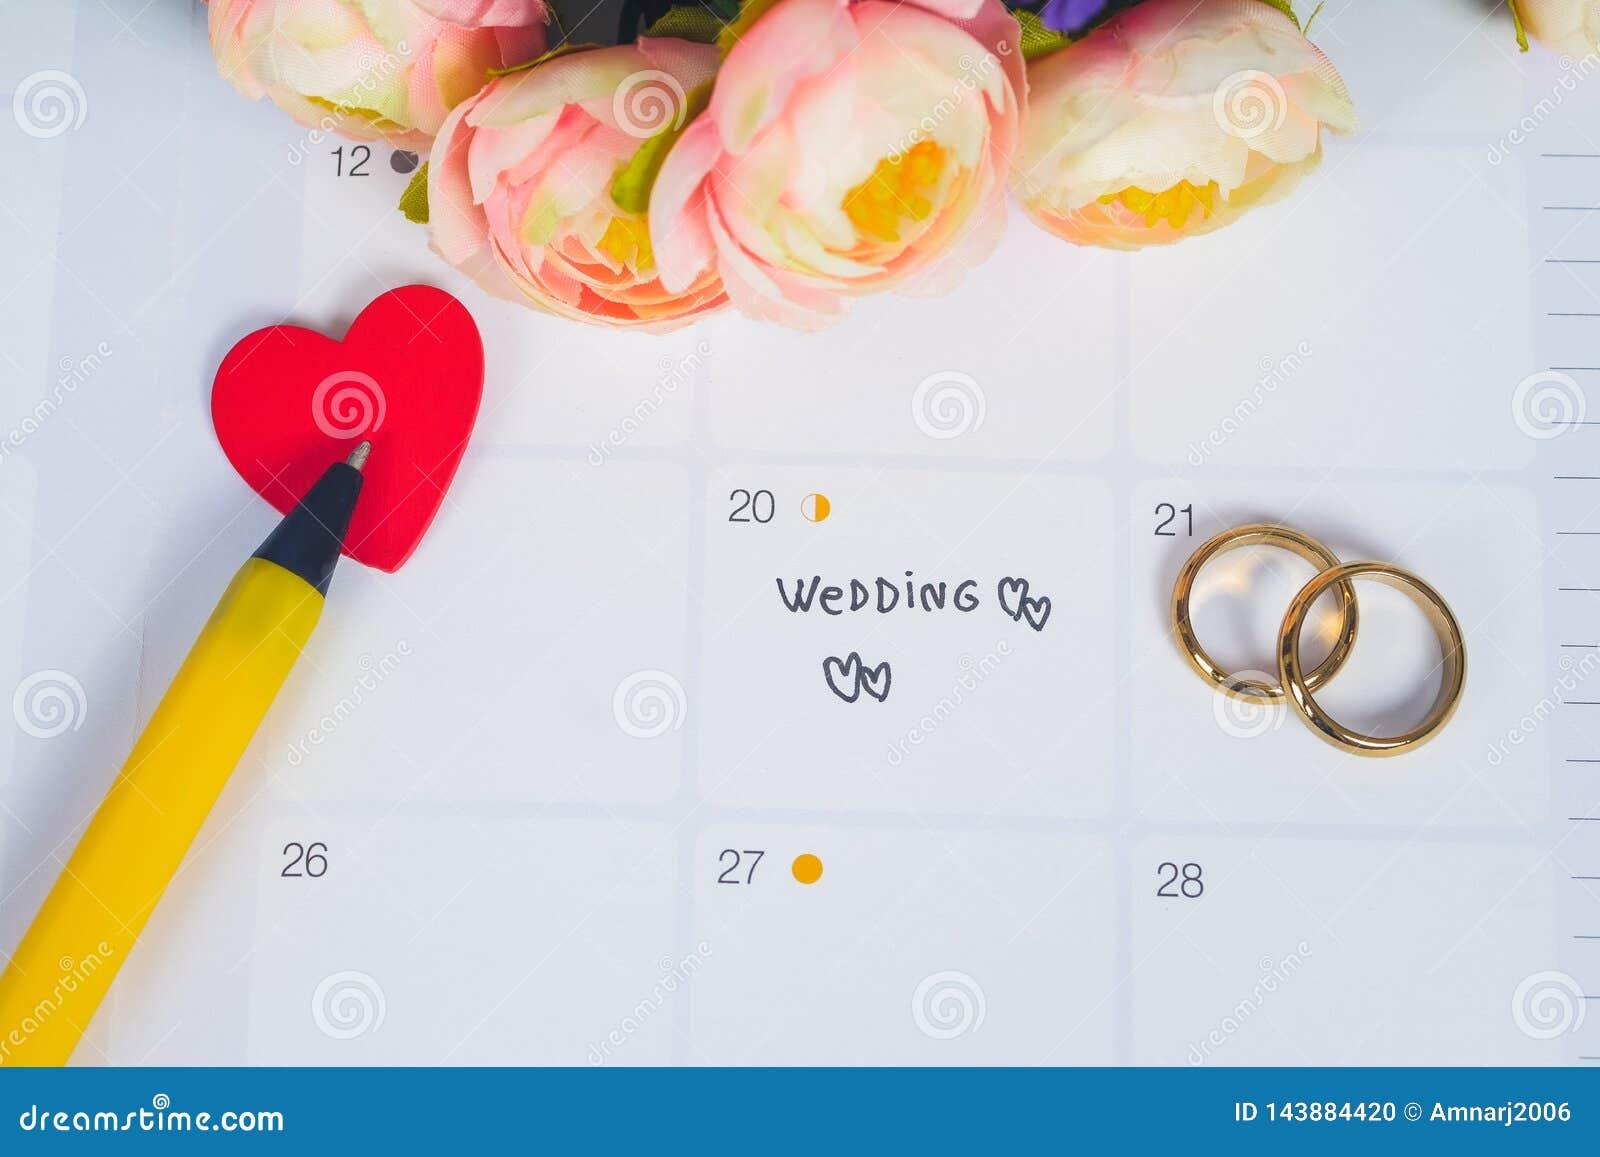 Word Wedding to Reminder Wedding day with Wedding ring on calendar planning